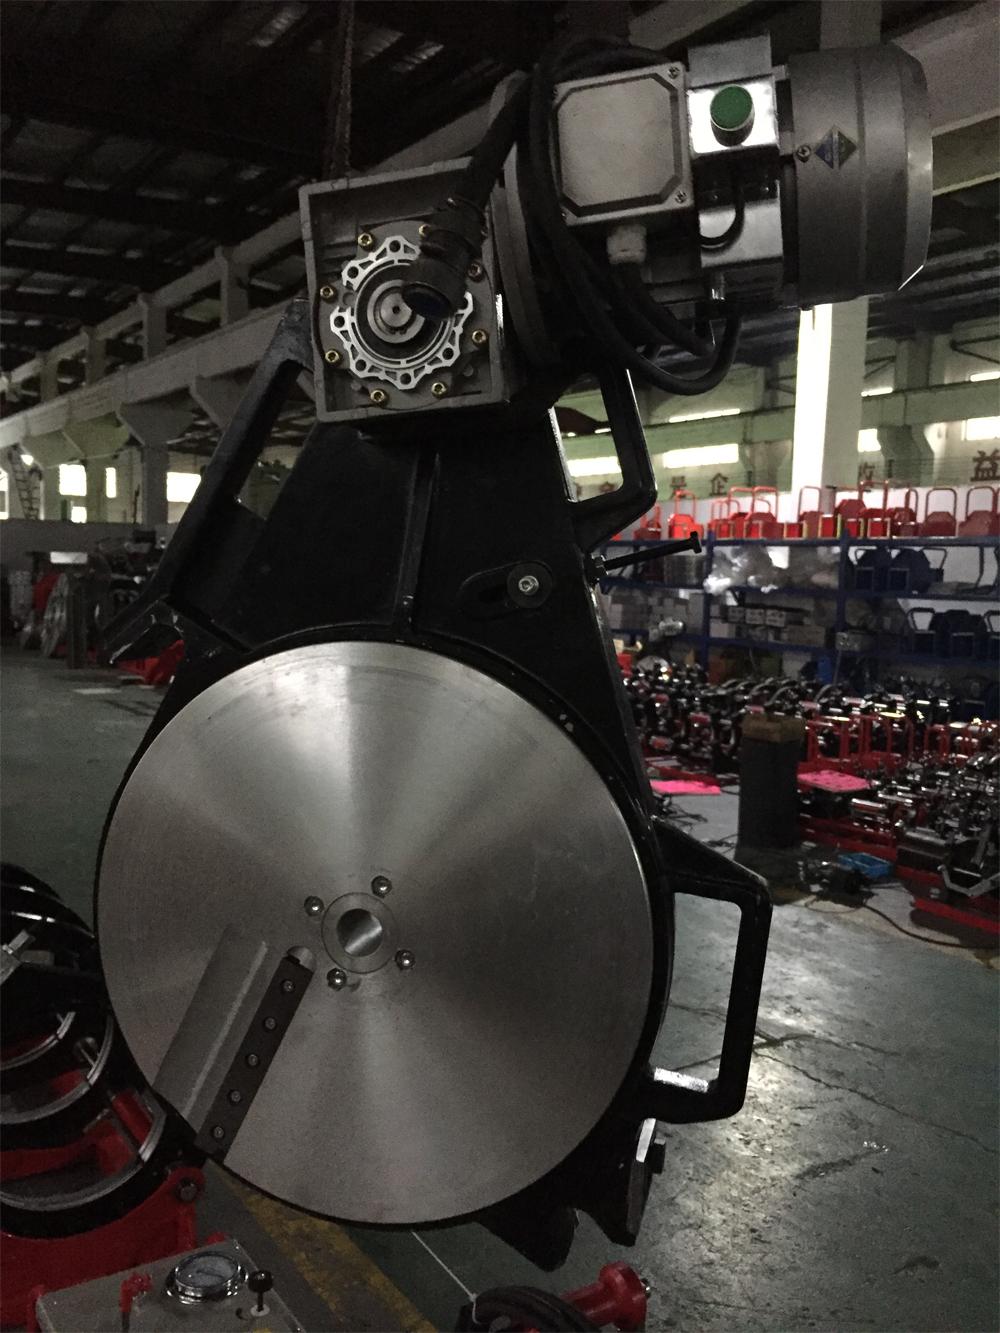 SDD450 fabrikant originele pe buis fusion butt lasmachine